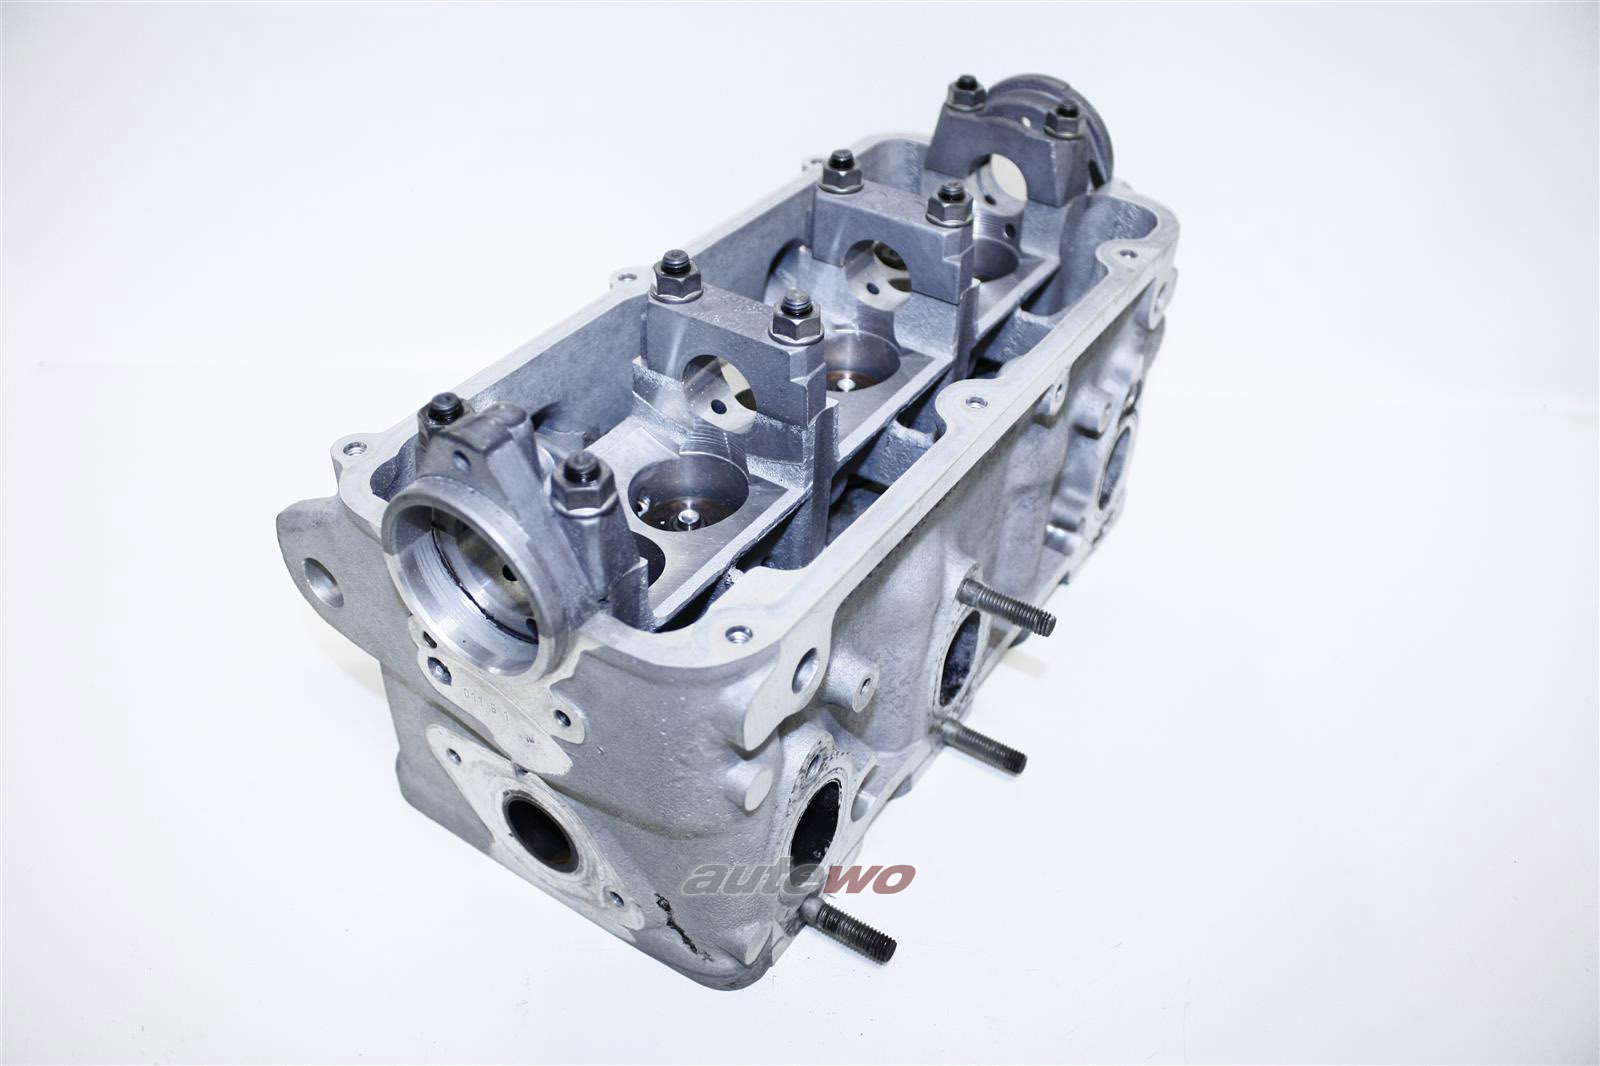 078103351B Audi 80 B4/100/A6 C4 2.6-2.8 ABC 23237 Zylinderkopf Rechts 143300km